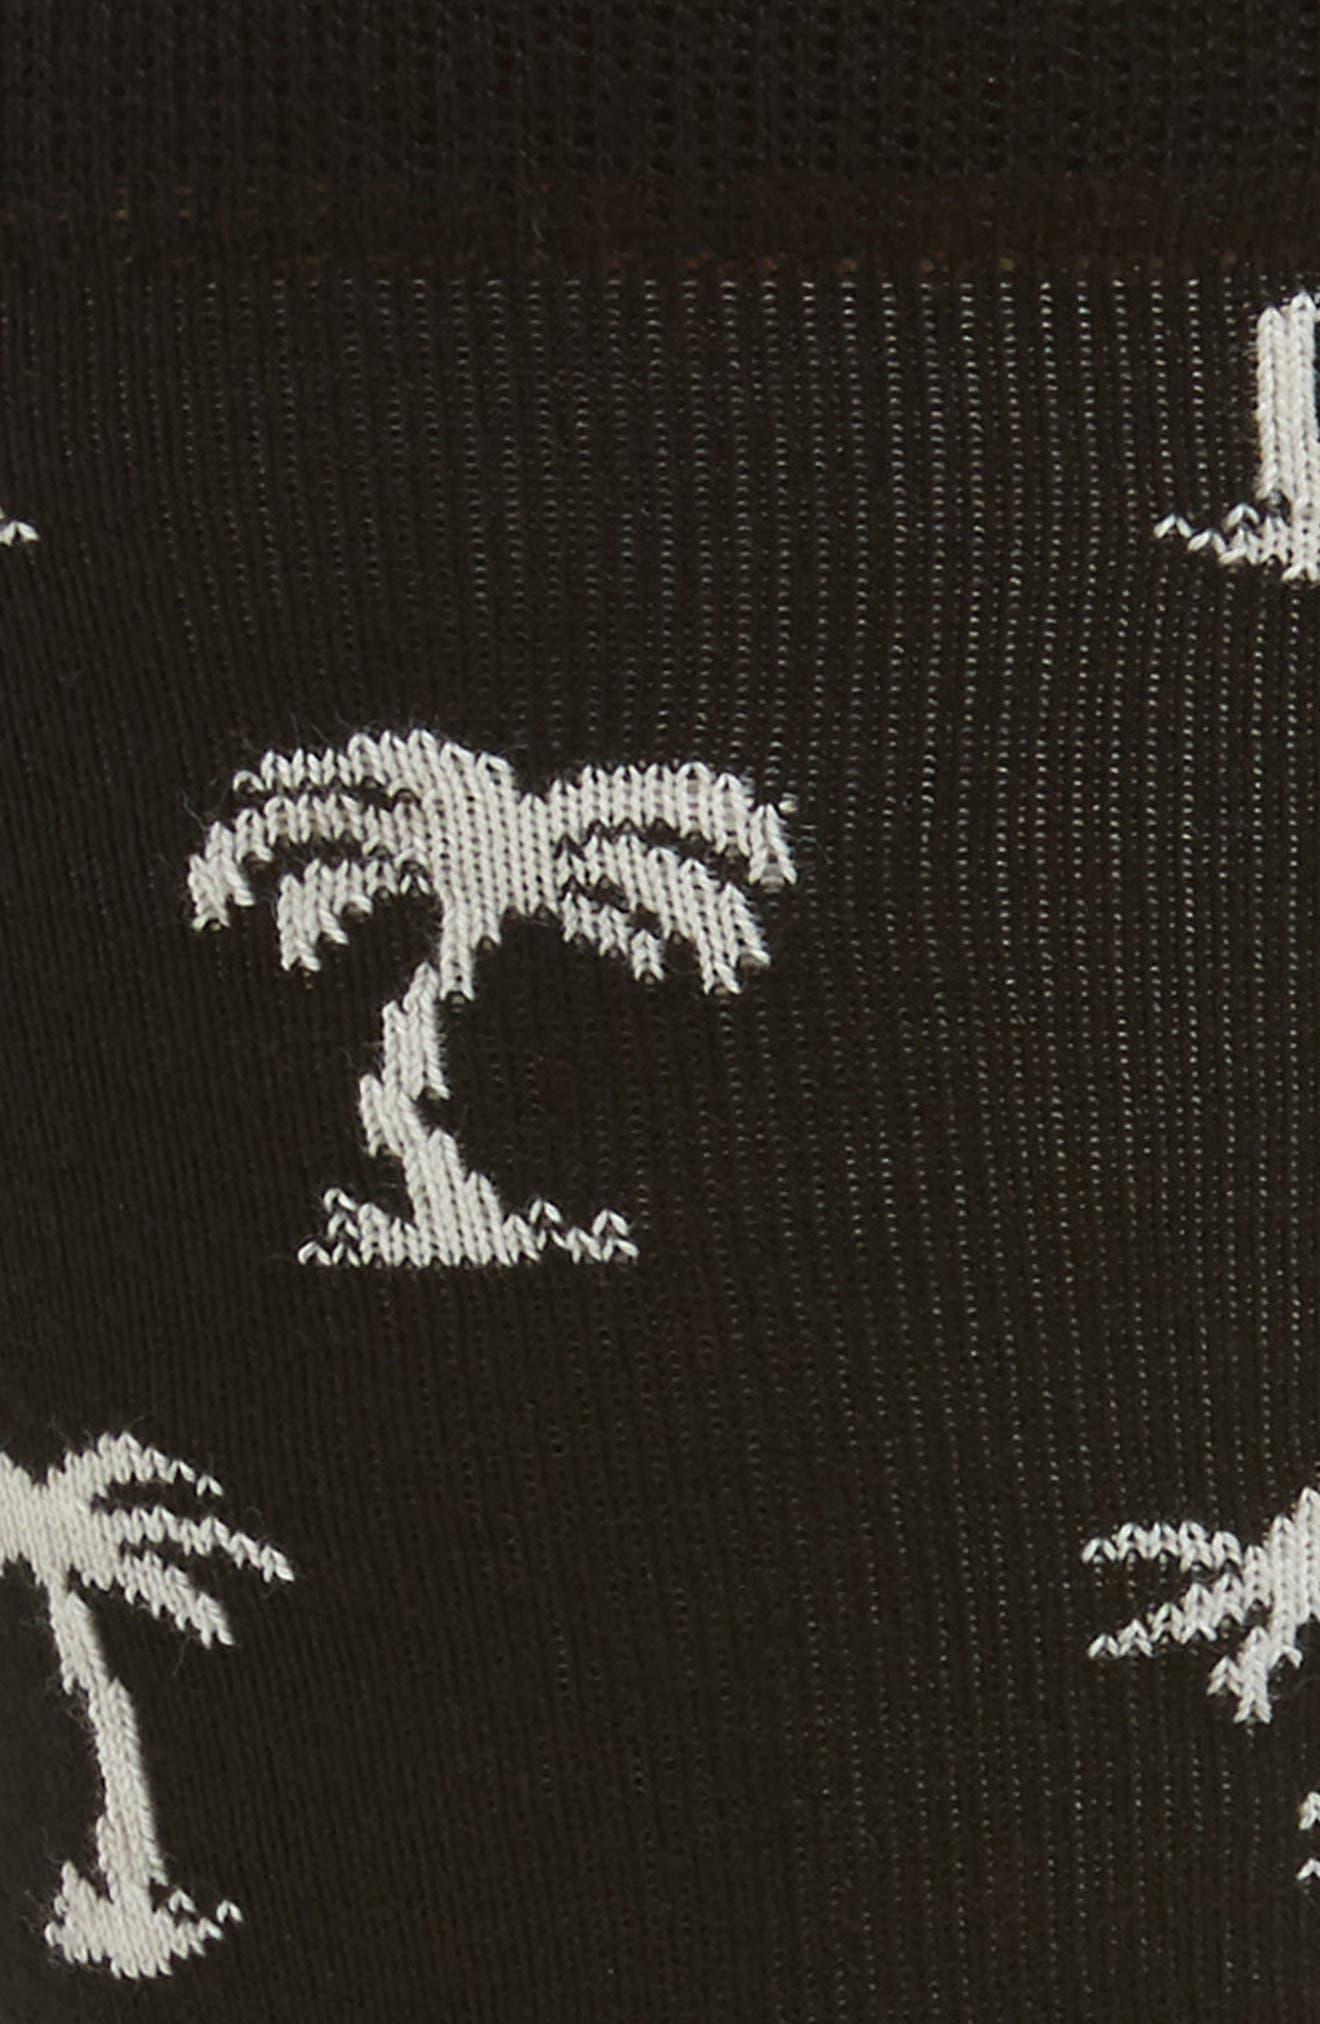 Palm Beach Crew Socks,                             Alternate thumbnail 2, color,                             Black/ White